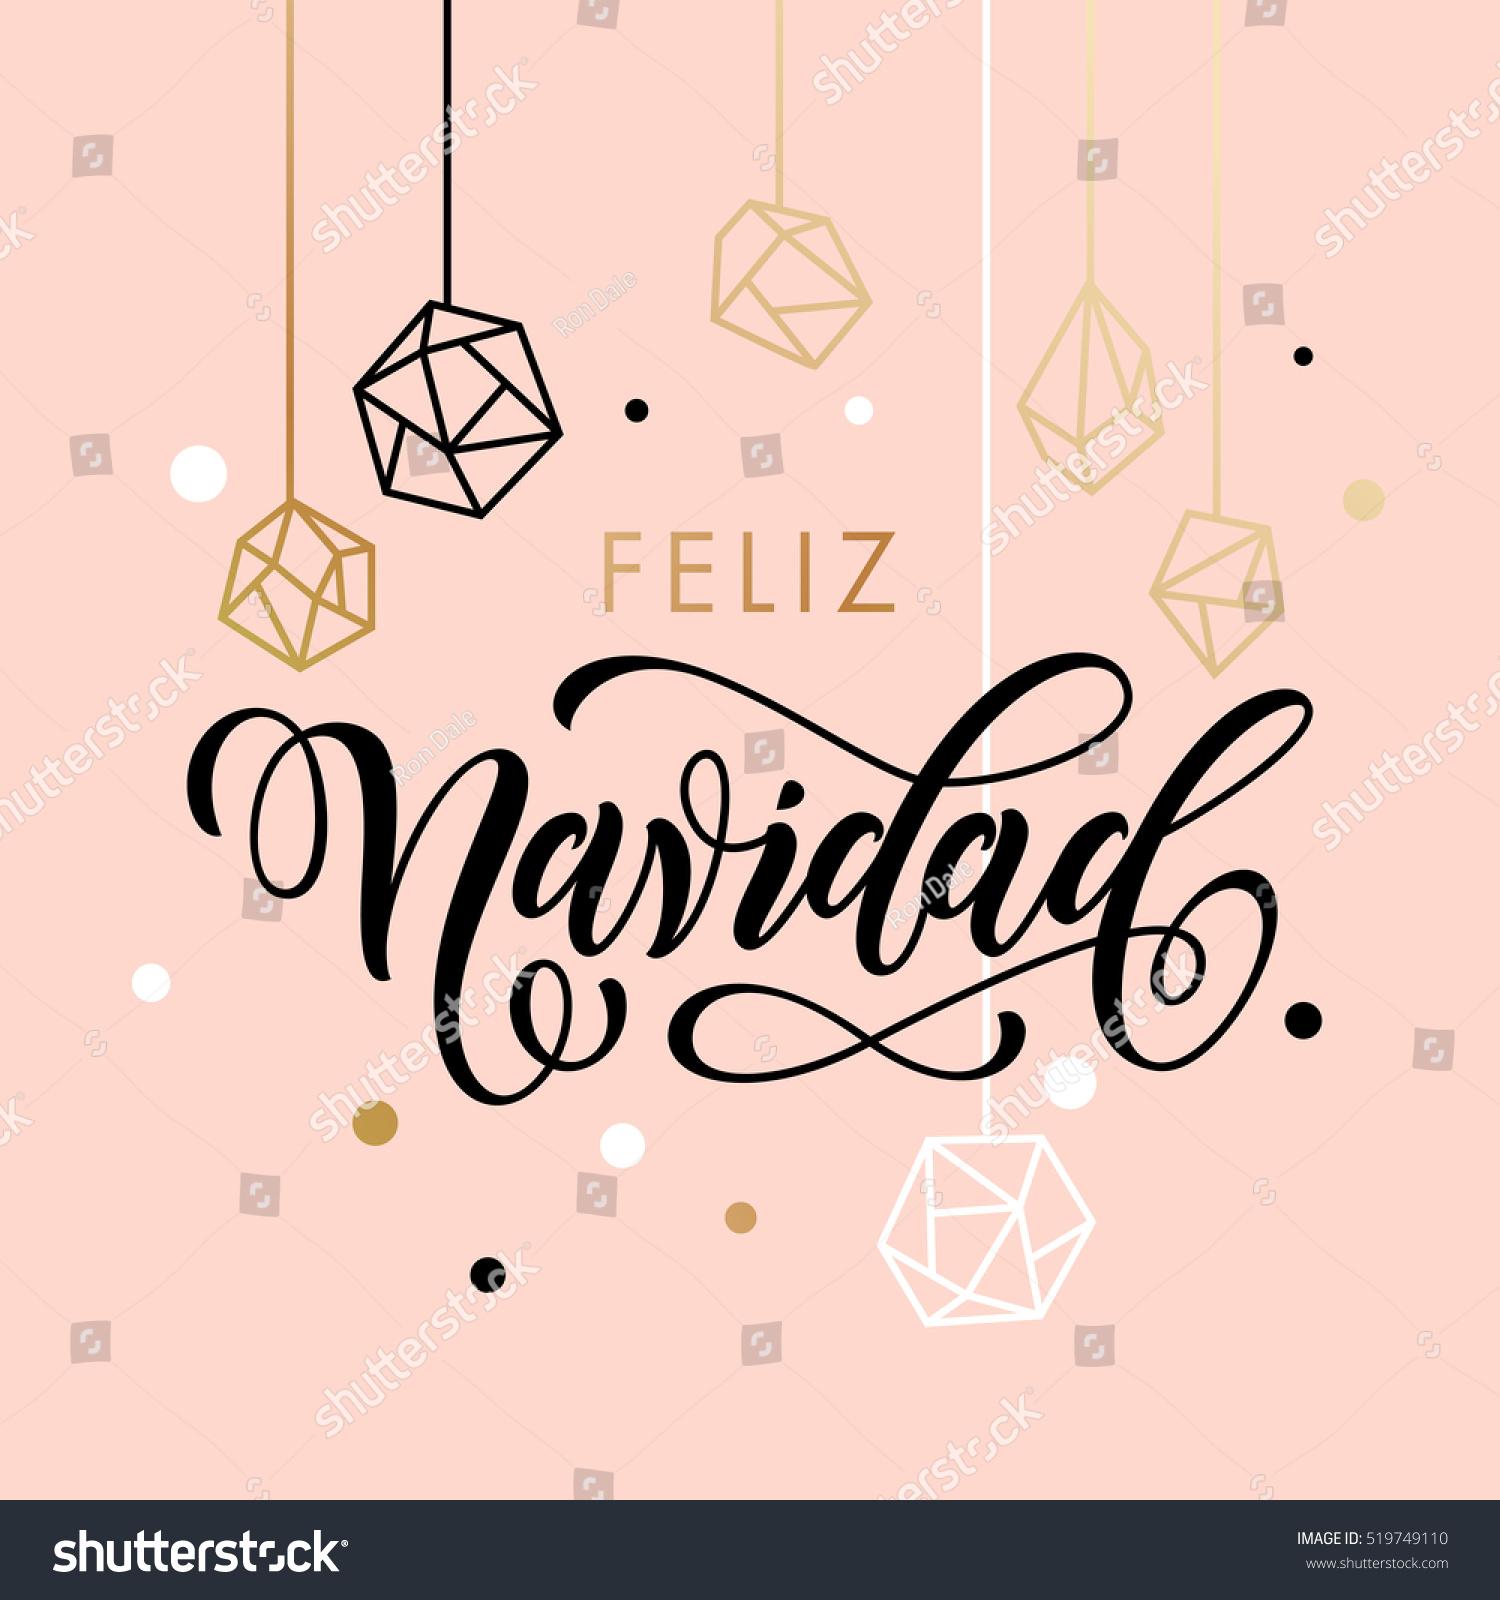 Spanish Merry Christmas Feliz Navidad Greeting Stock ...